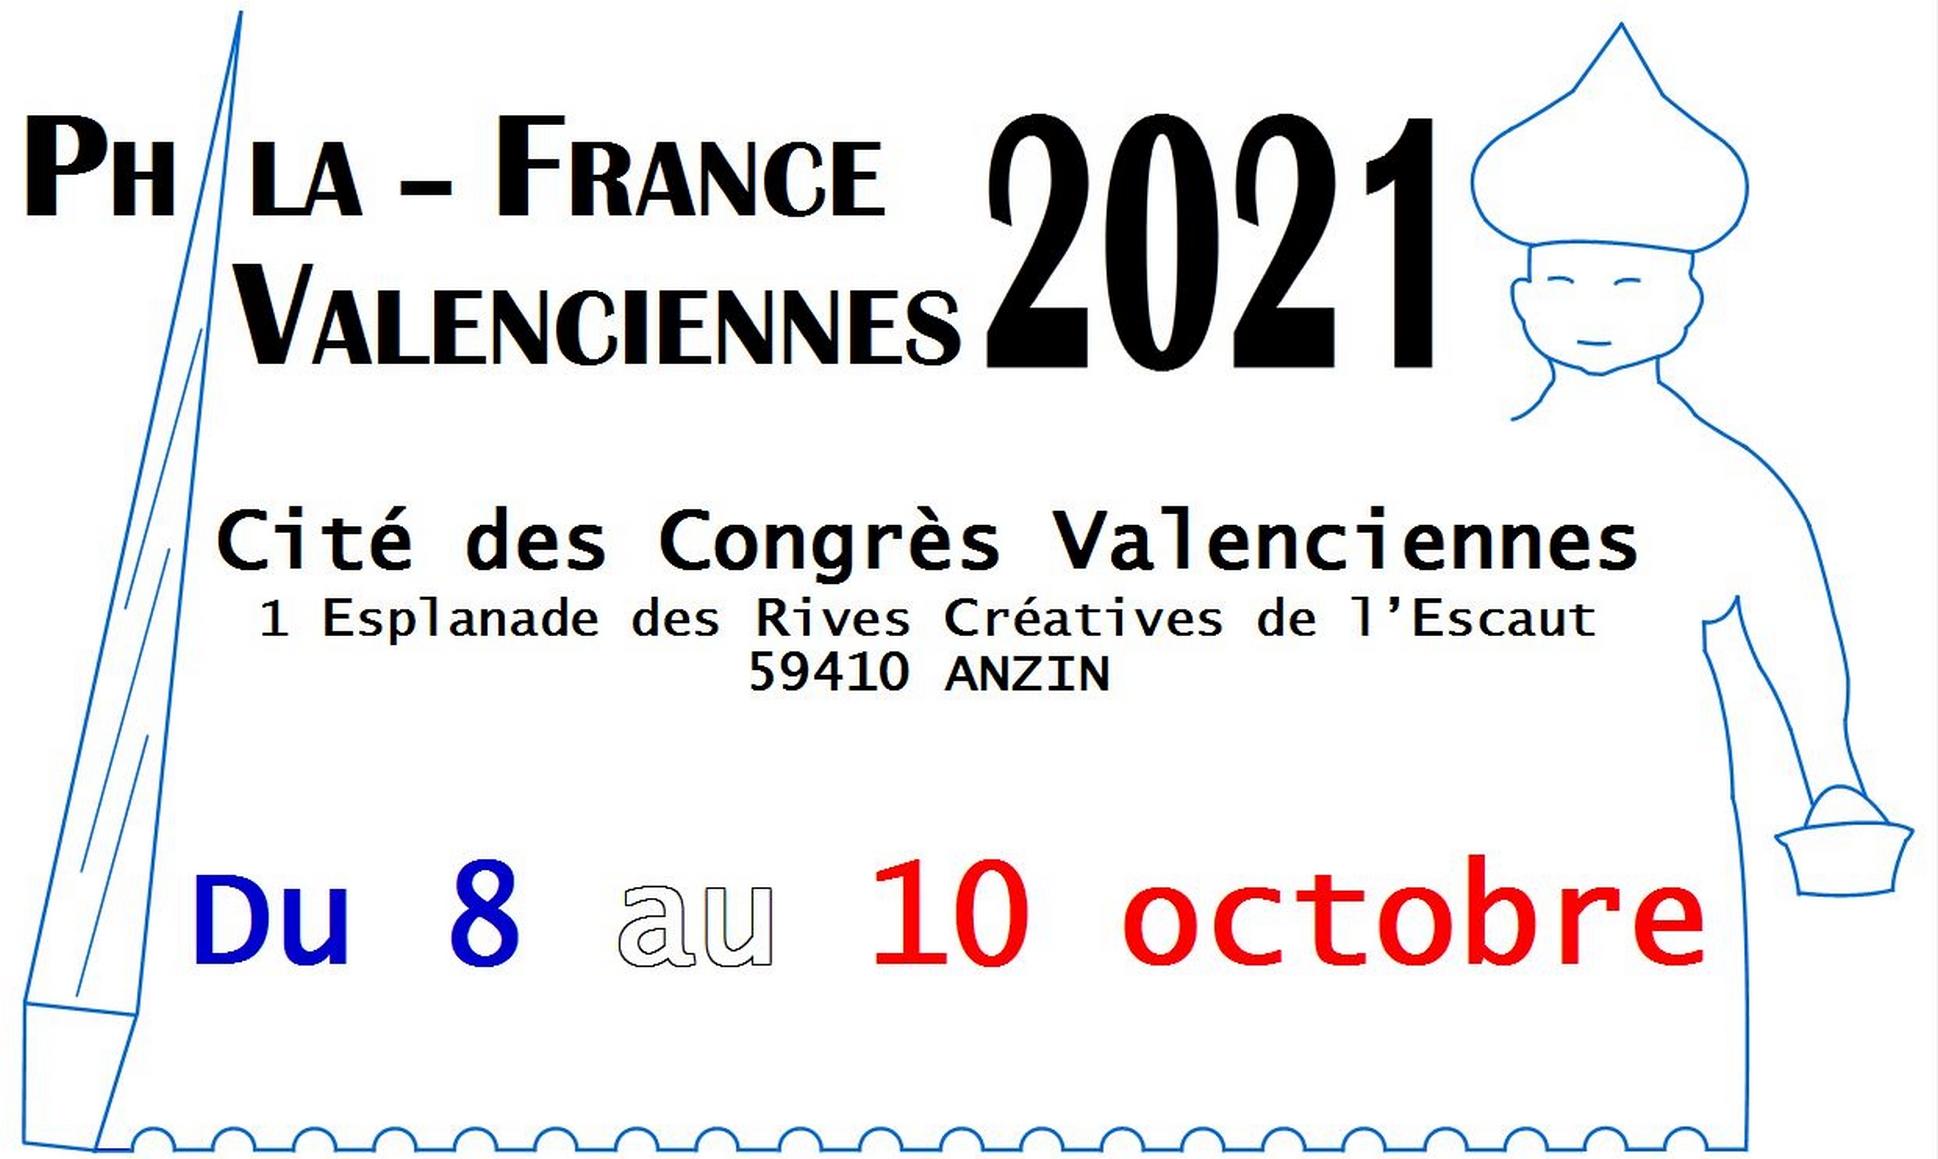 Valenciennes Phila France 2021